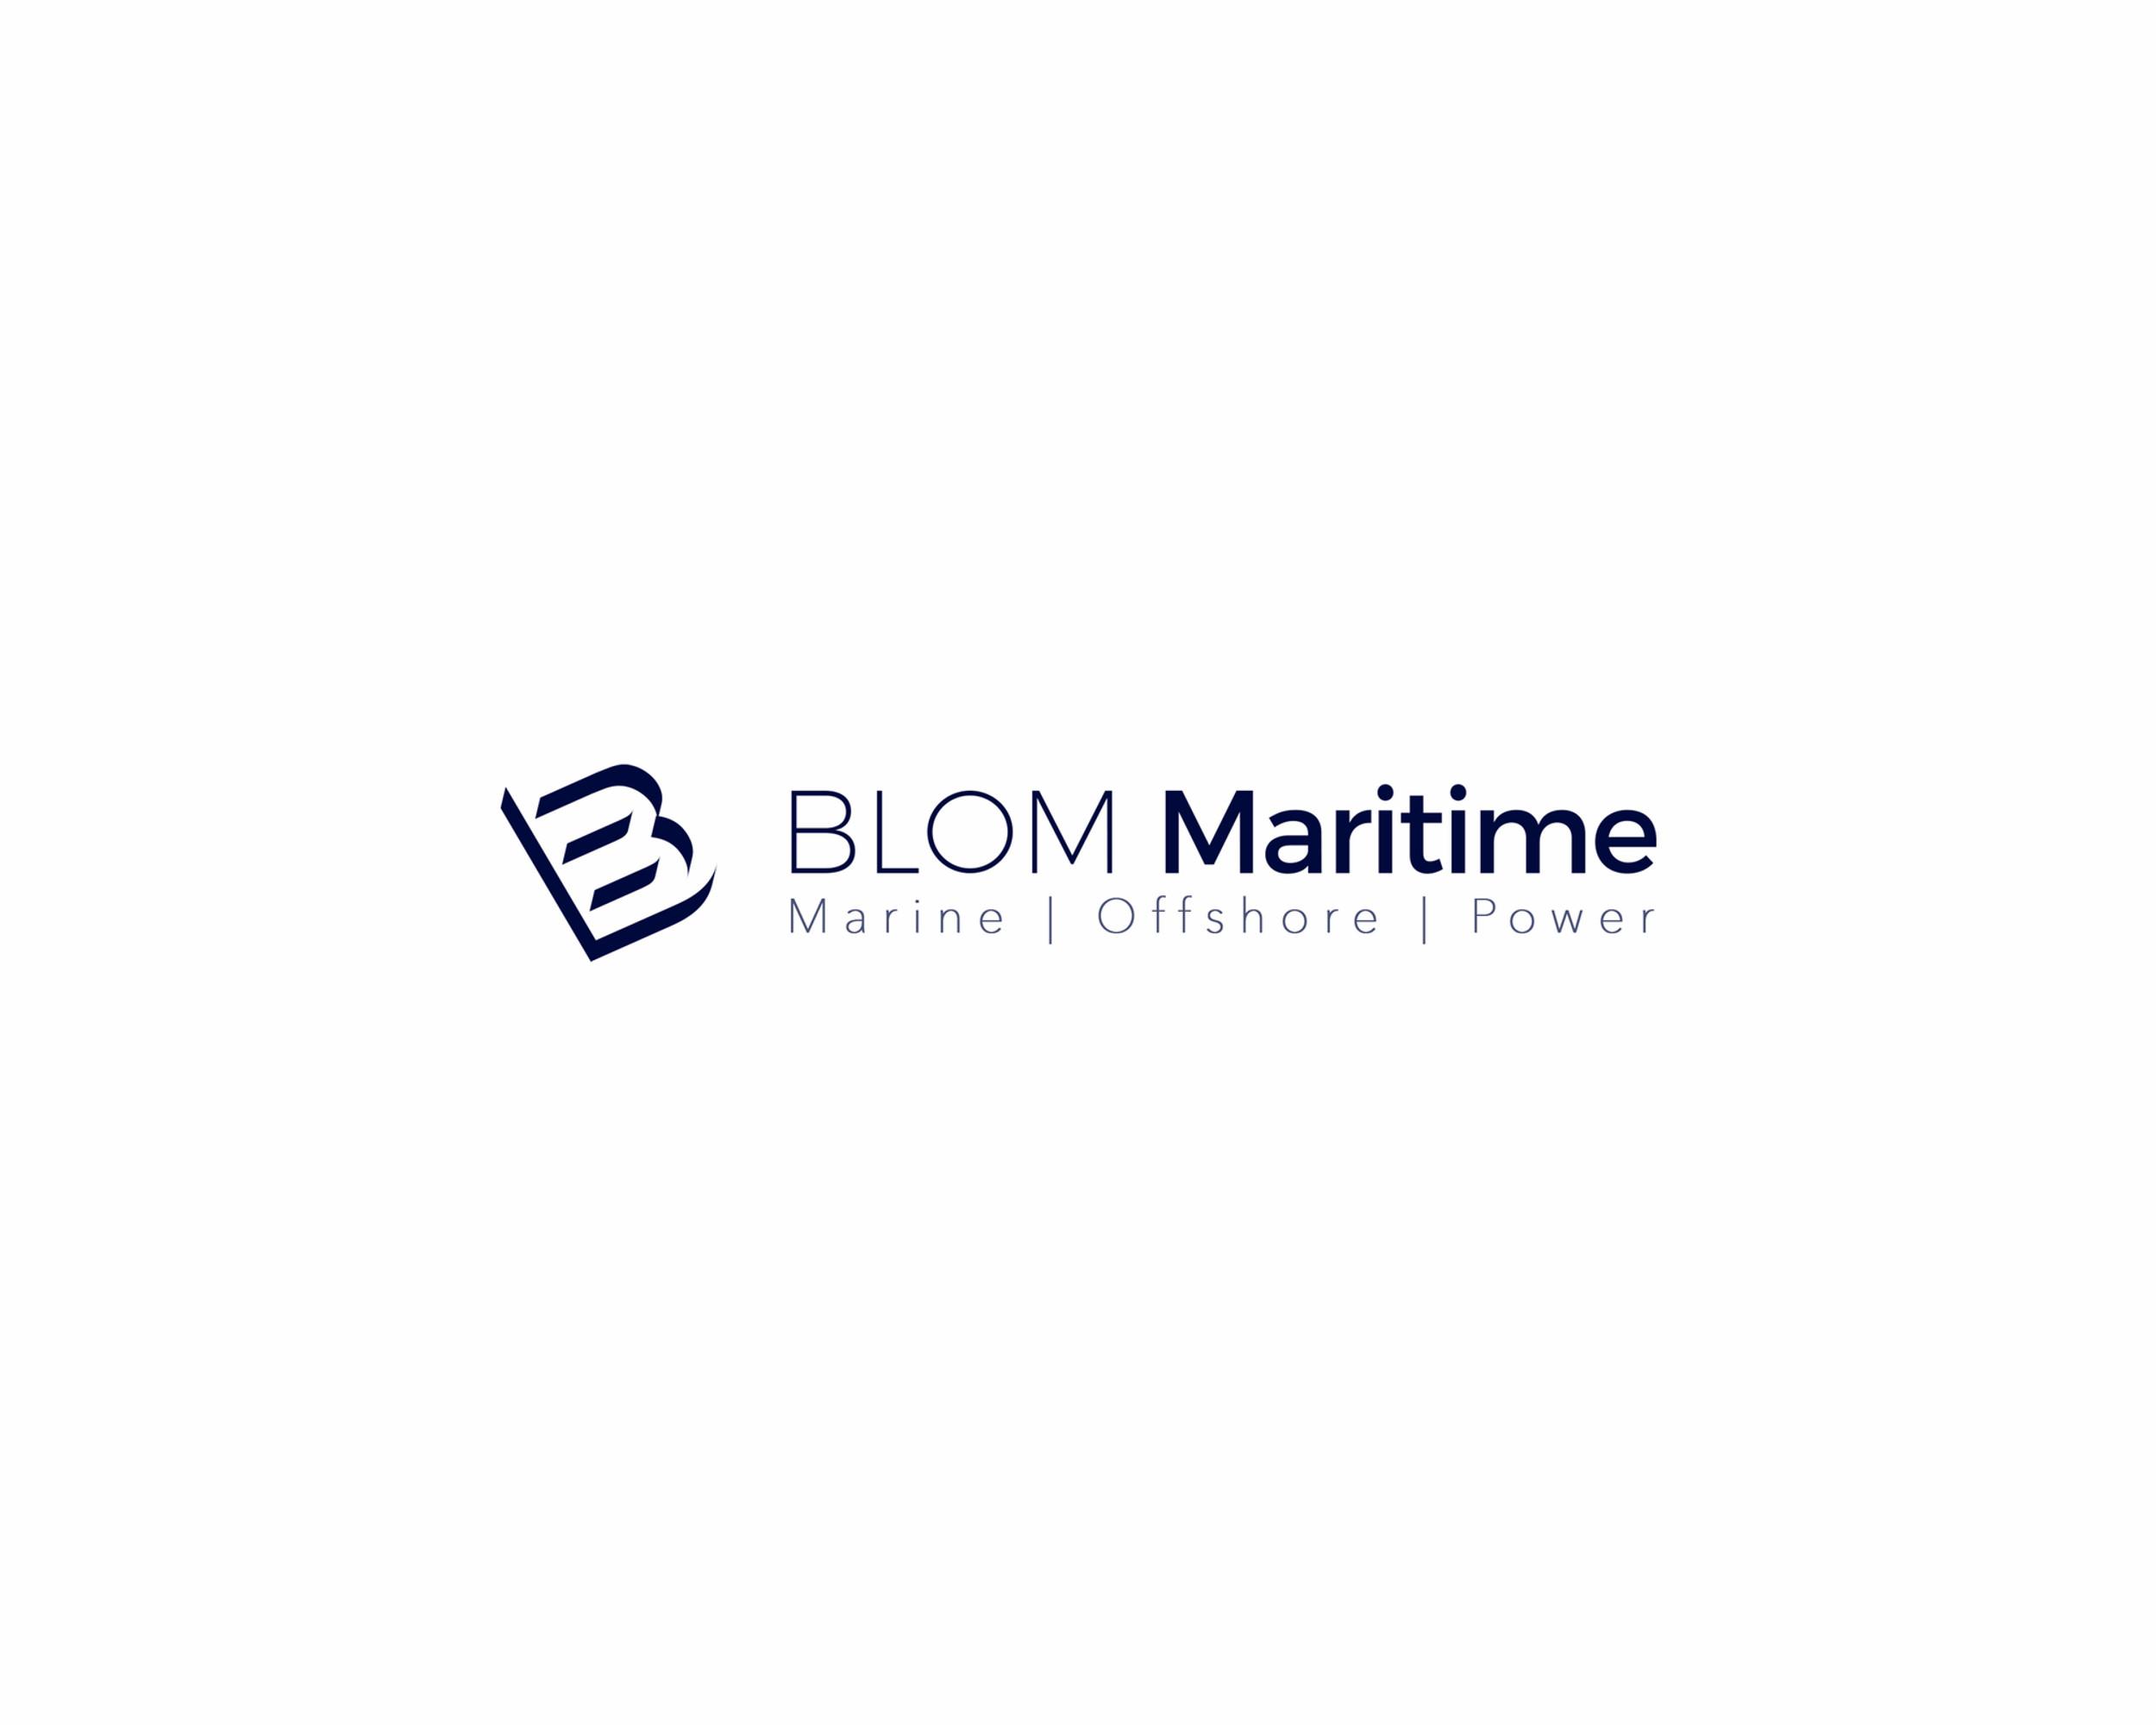 Blom Maritime AS